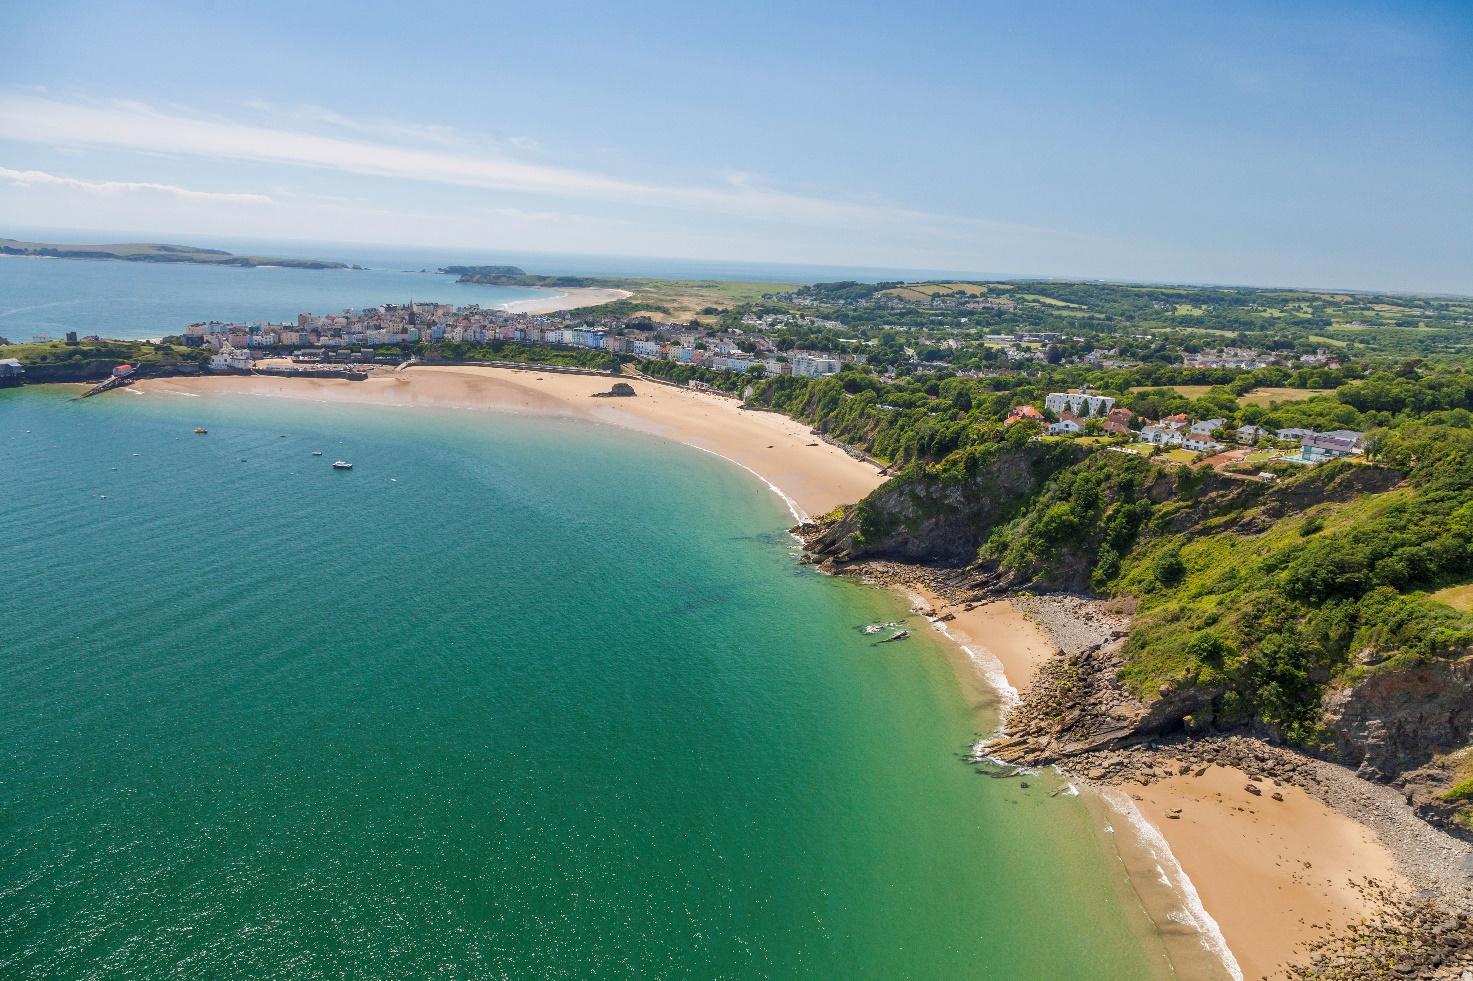 Pembrokeshire Coastal National Park